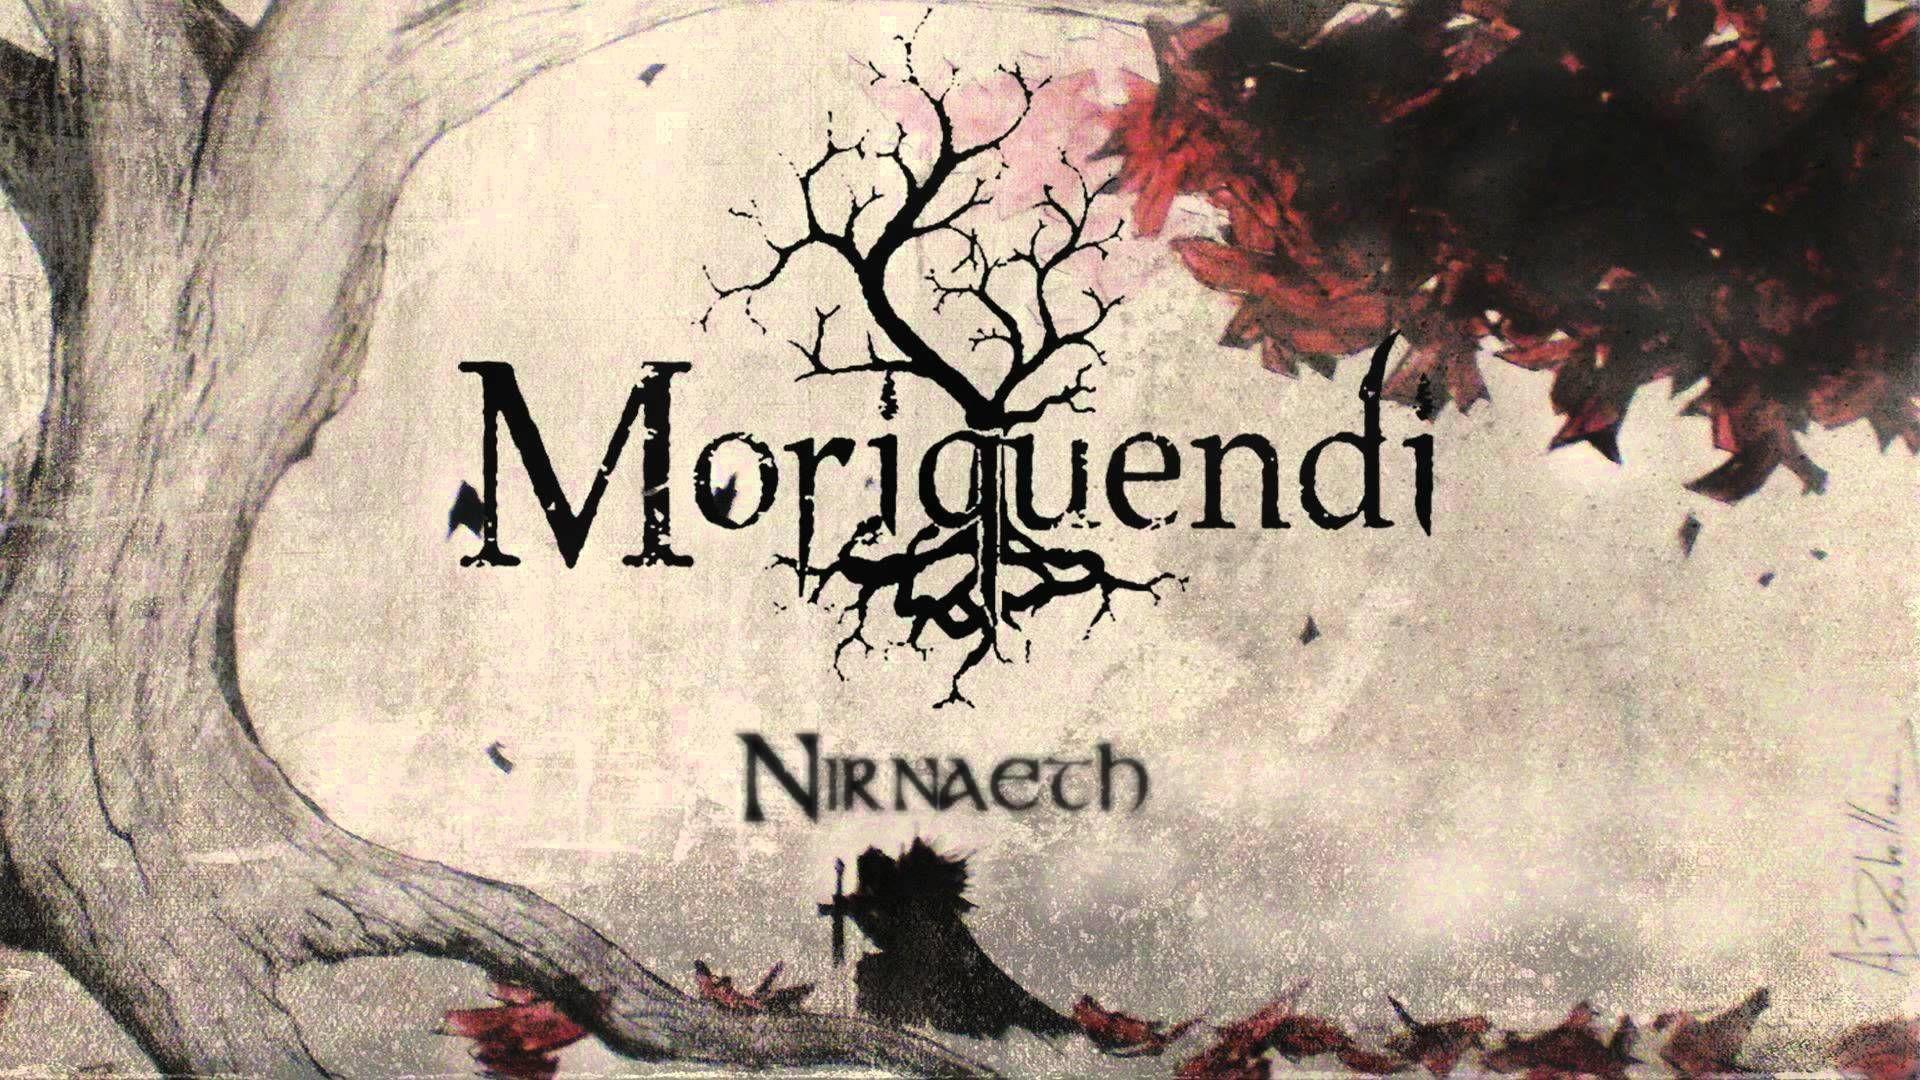 Moriquendi - Nirnaeth